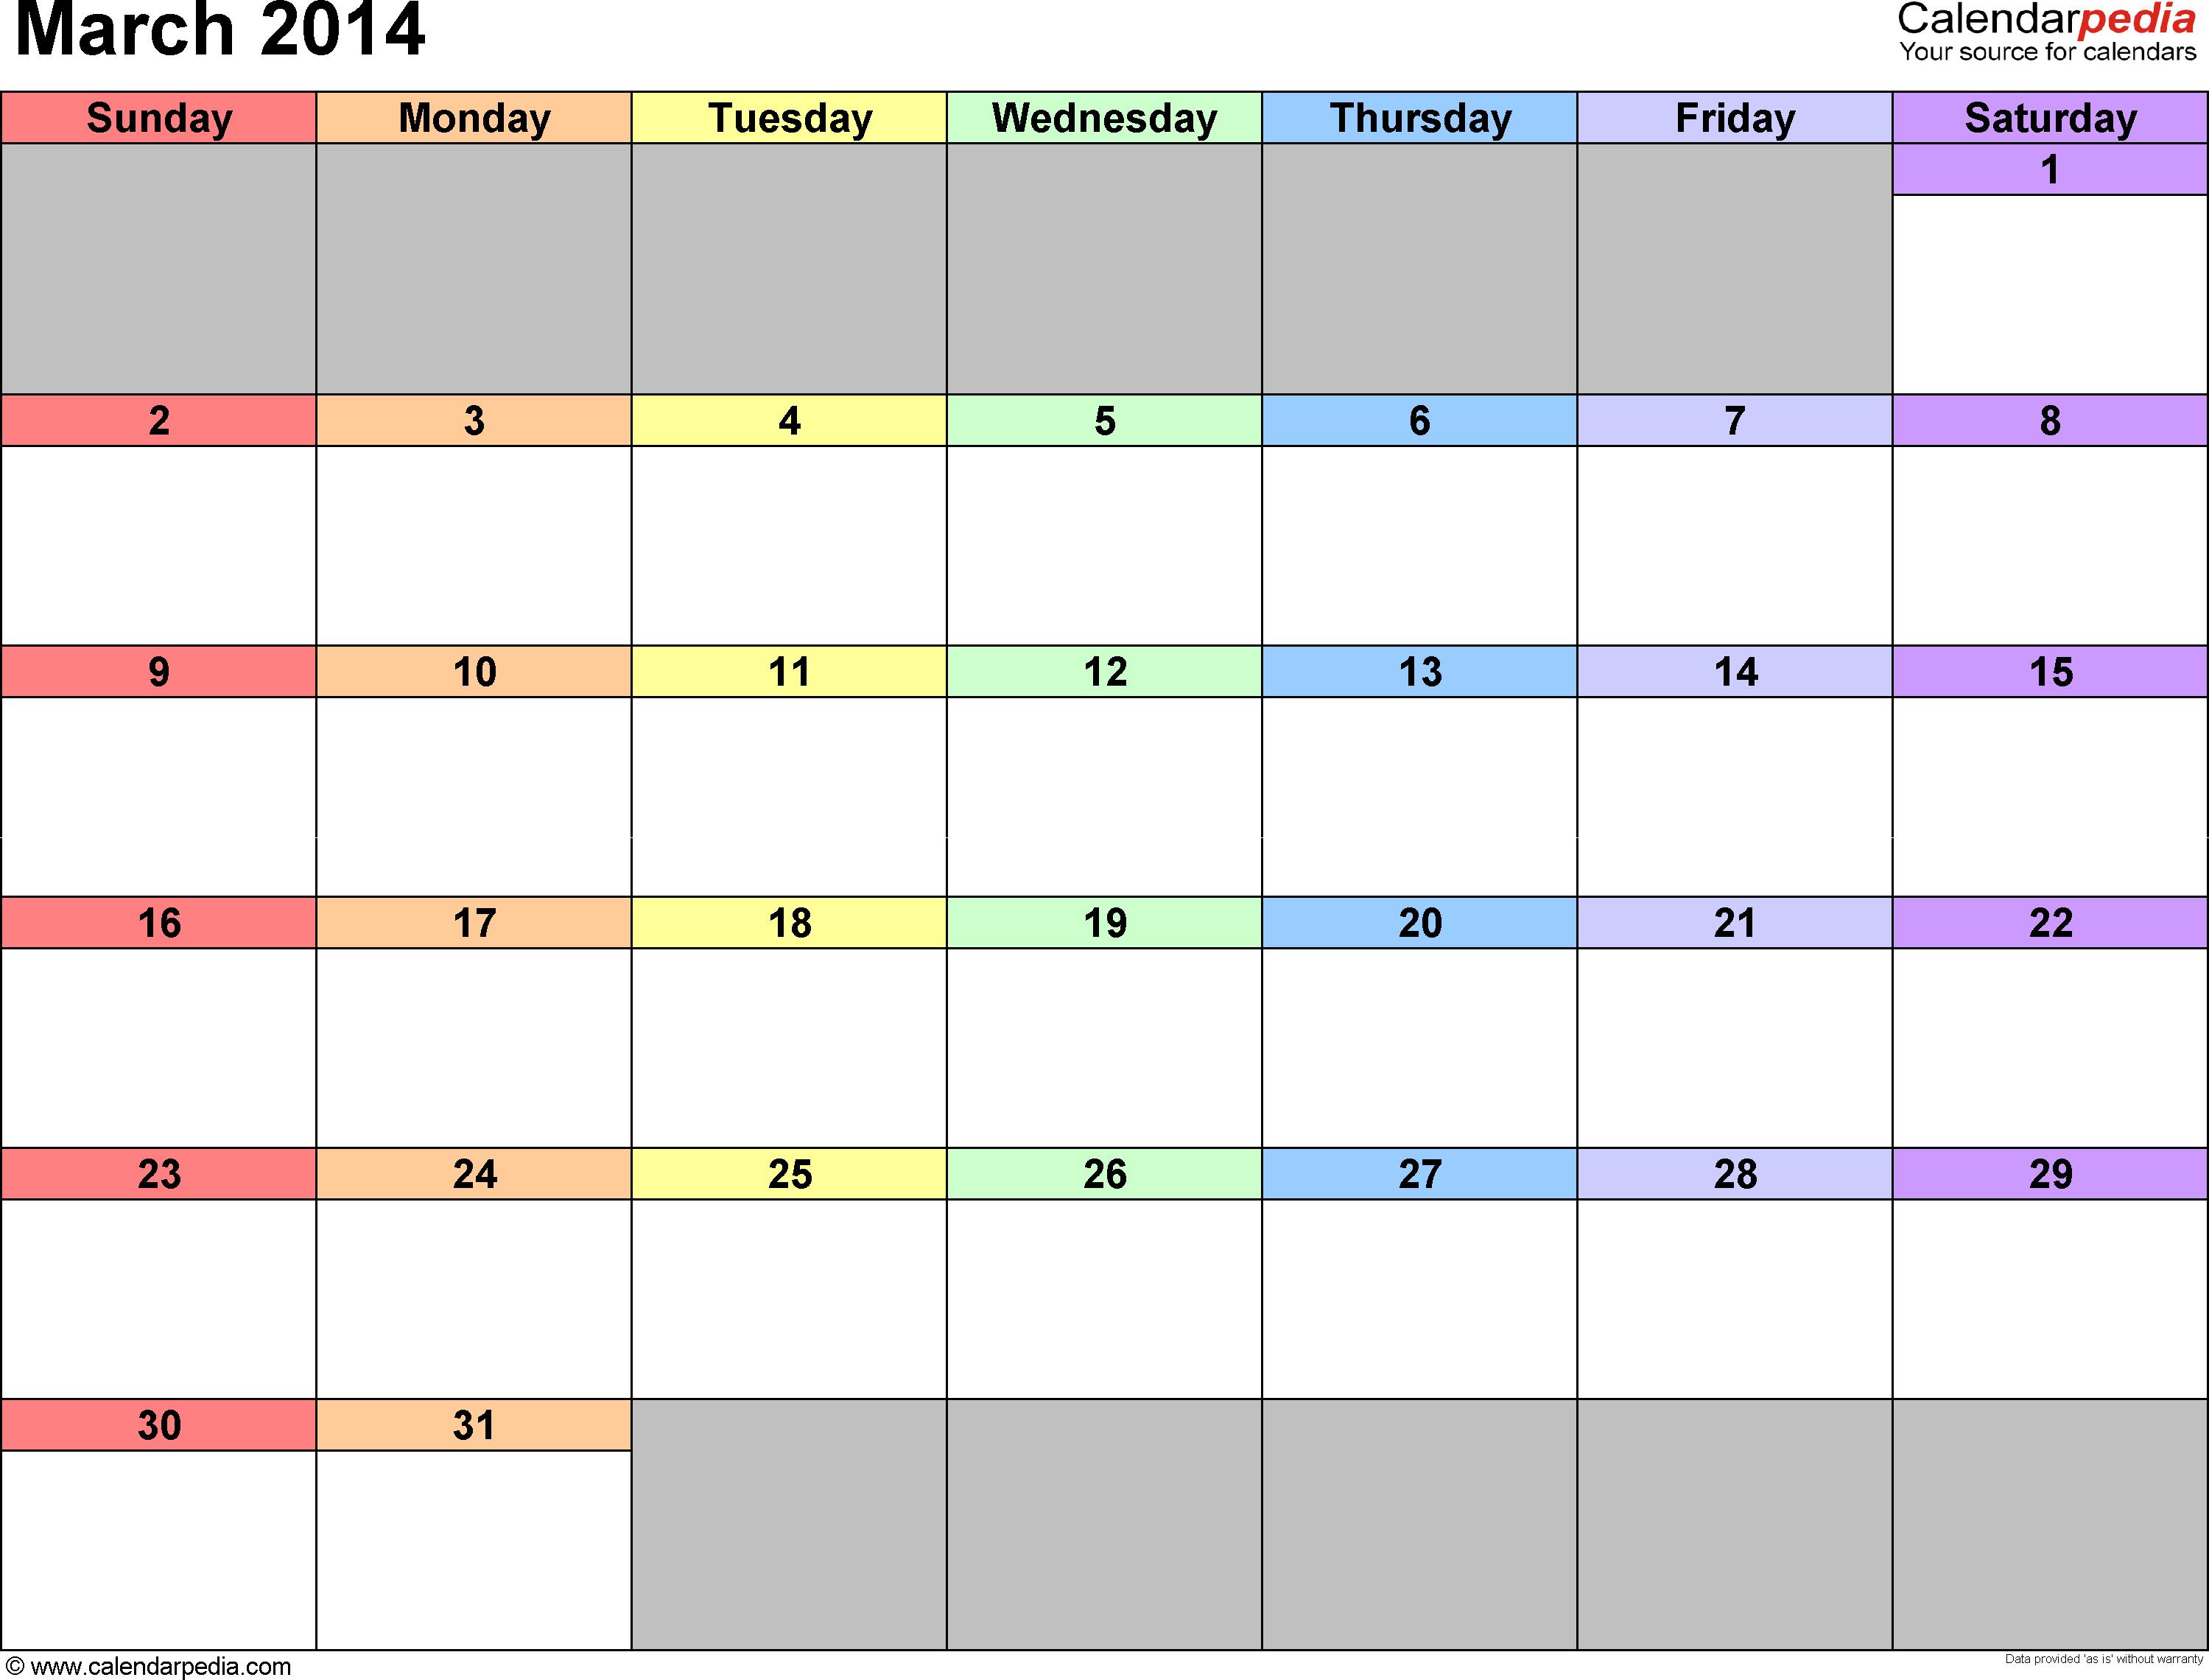 31 day portrait calendar